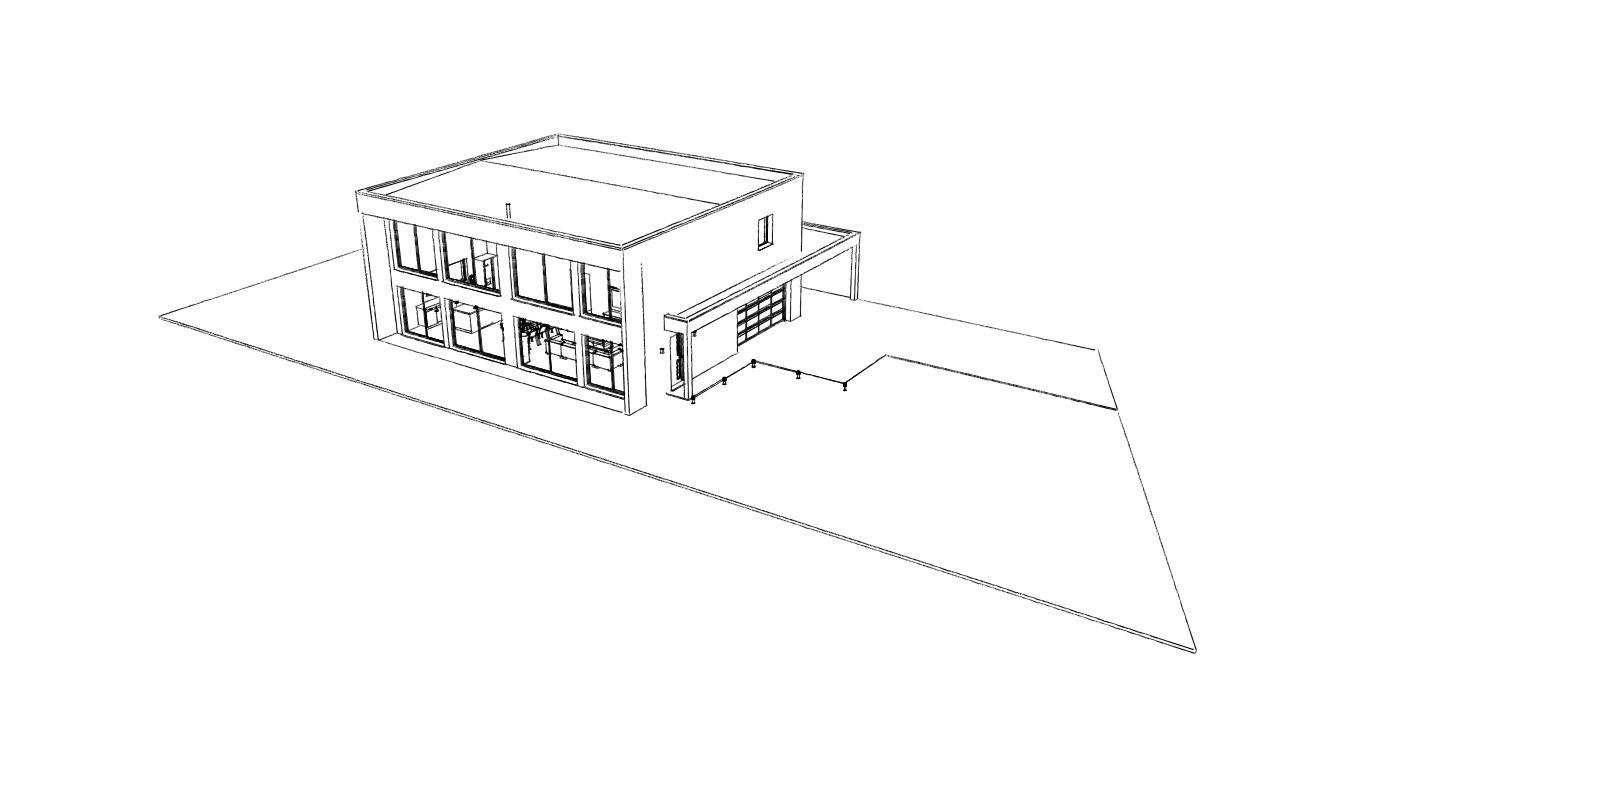 15.17 Permis de construire maison nord Thun Saint Amand1